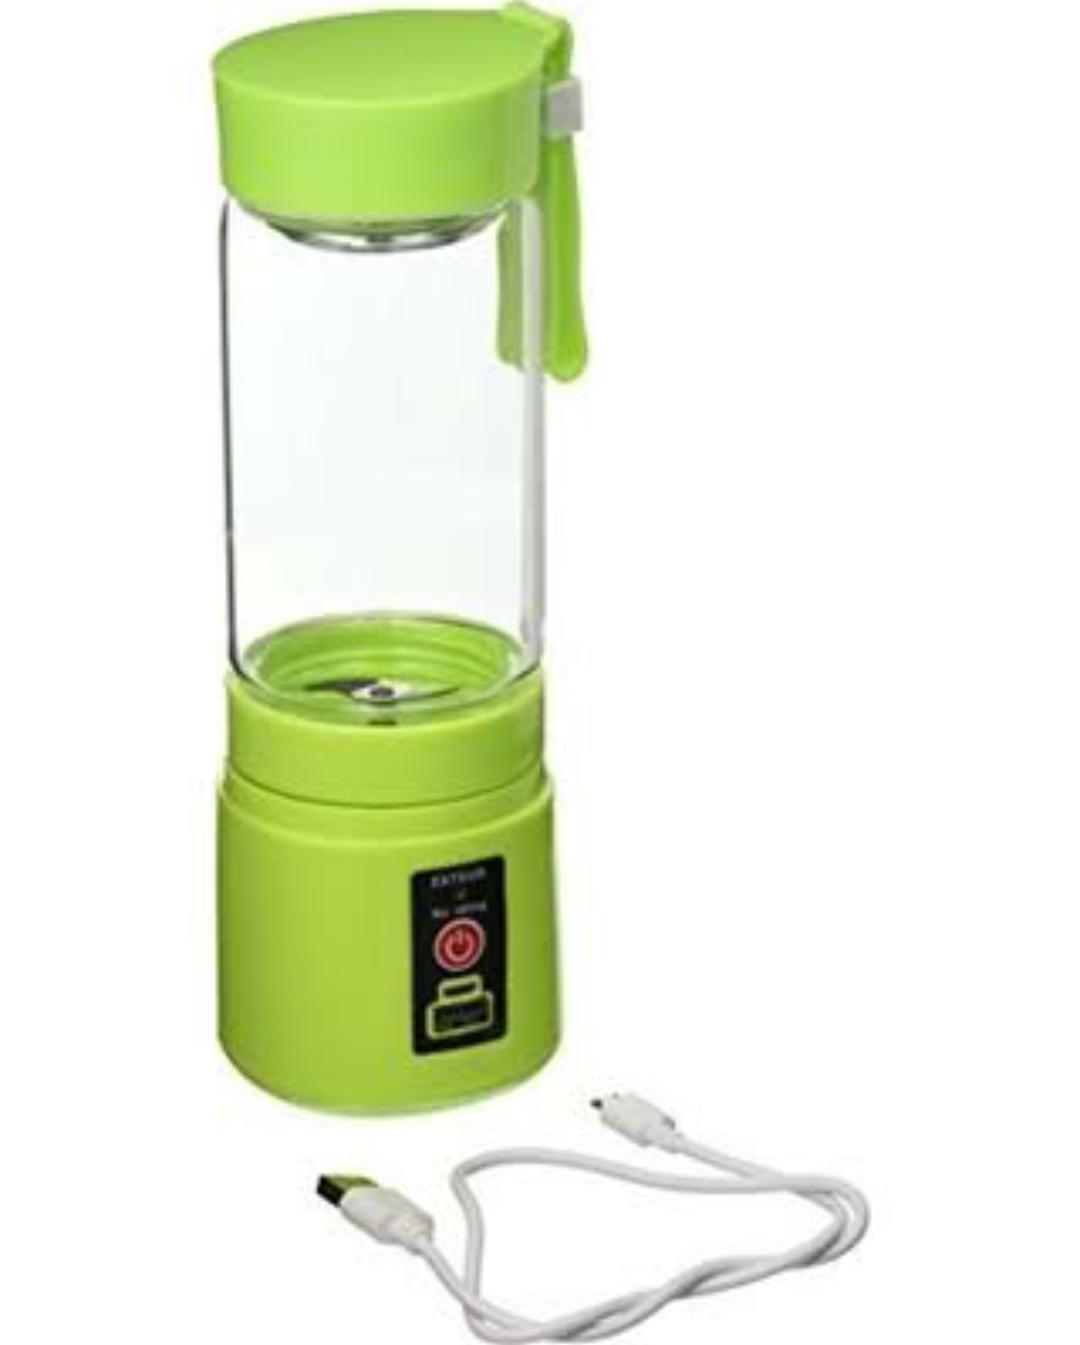 New Shake n Take Portable Rechargeable / Blender Mini / Juicer Mini / Blender Portable USB / Juicer Portable Model Terbaru